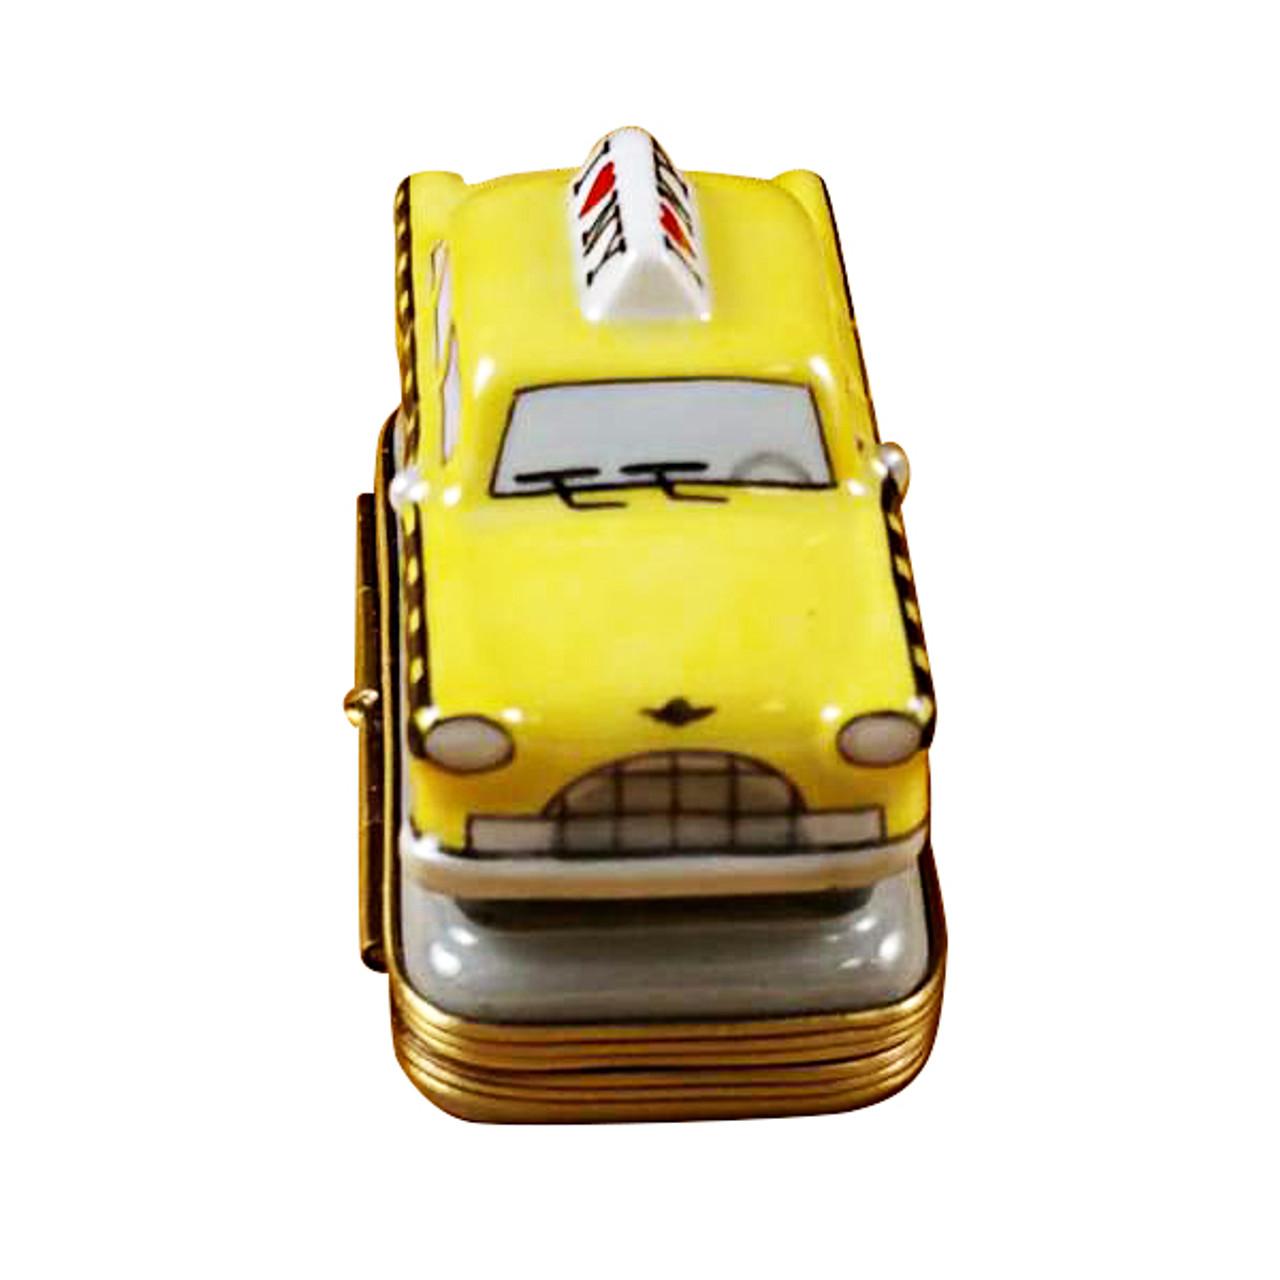 Yellow Taxi - I Love New York Rochard Limoges Box